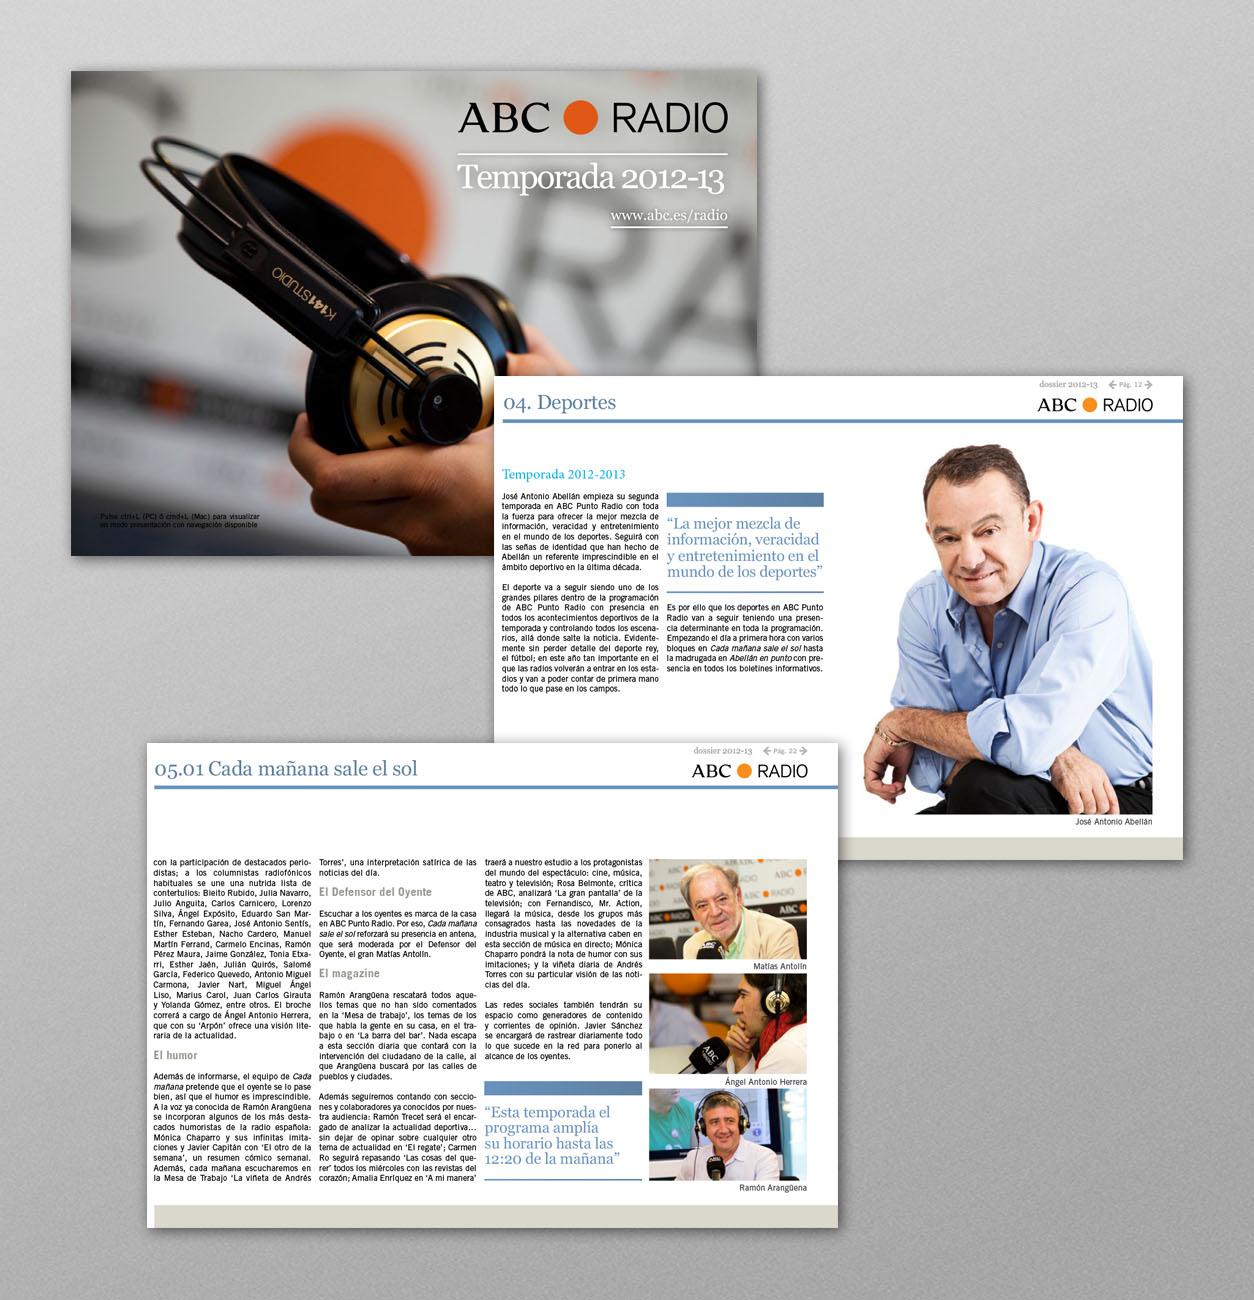 ABCPuntoRadio_comunicacion_02.jpg